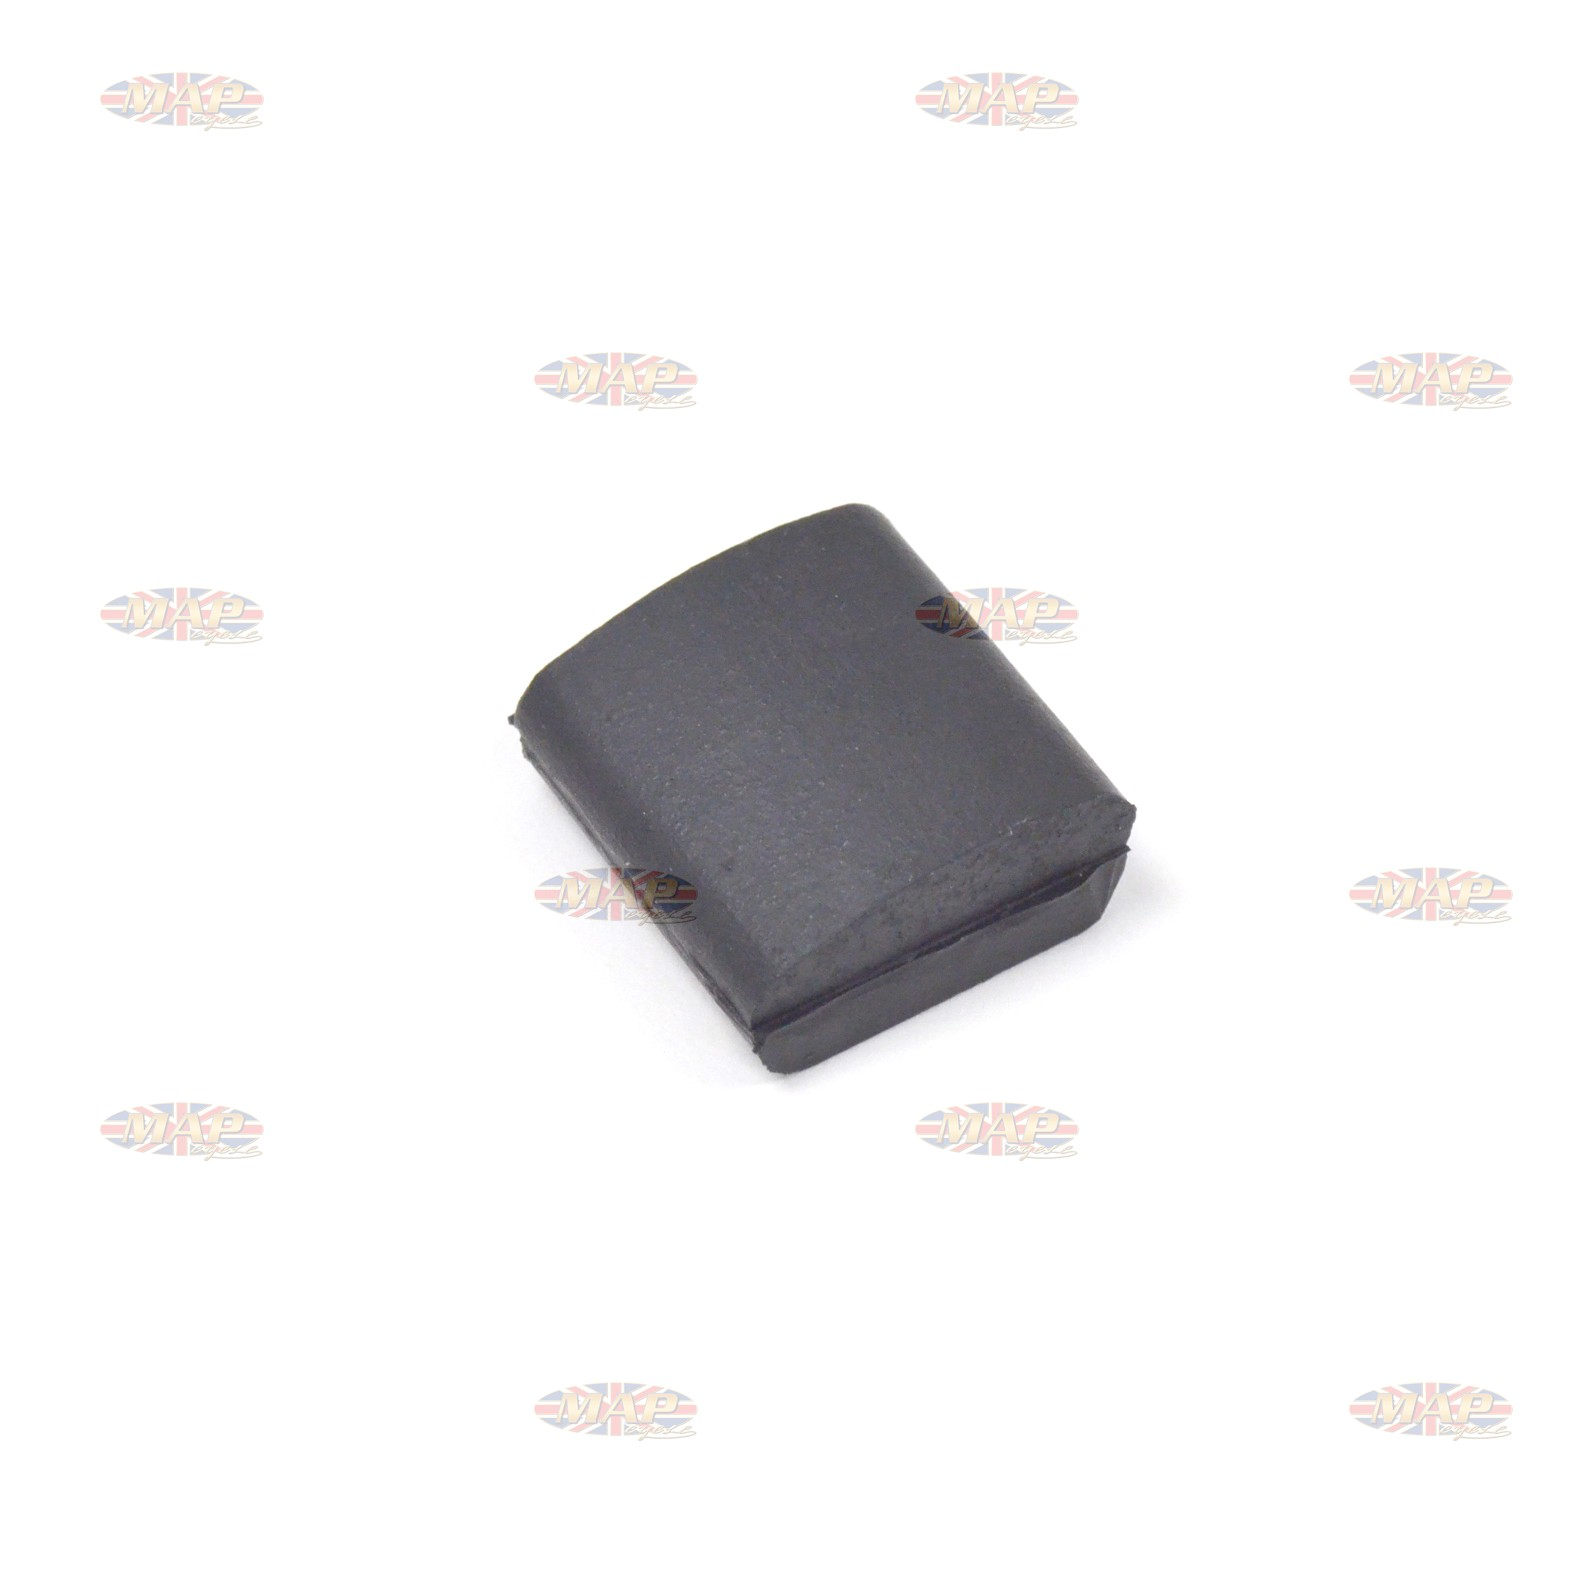 Norton Atlas and AMC Clutch Small Cush Rubber 04-0387